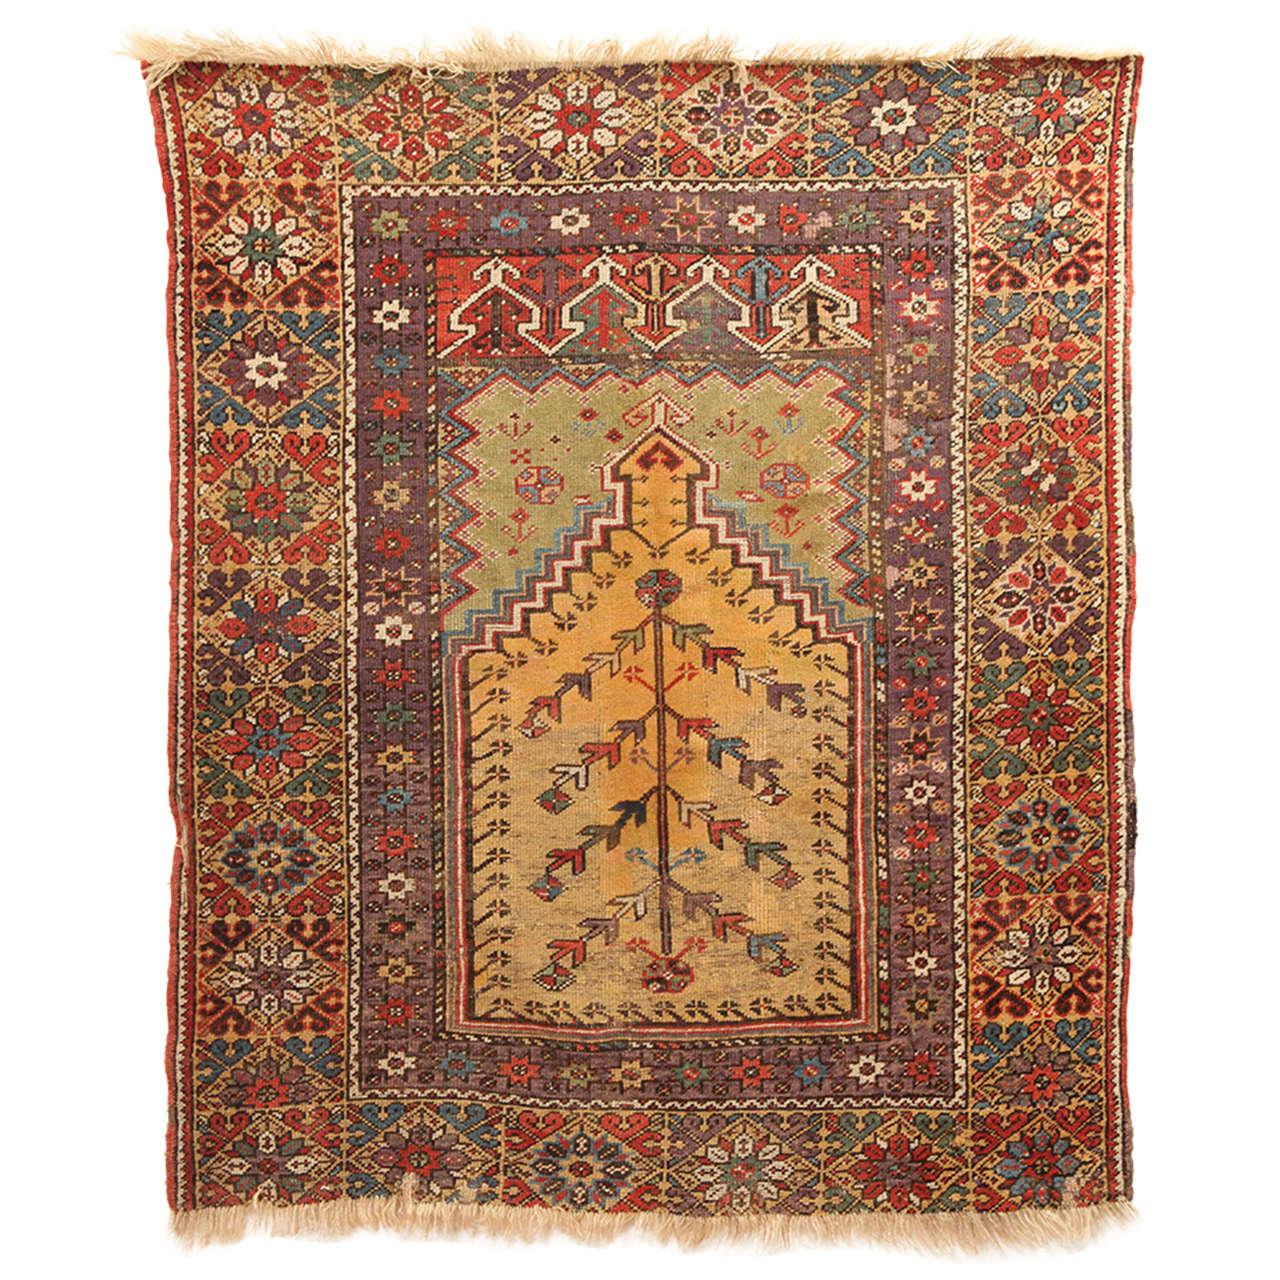 Persian Rug Los Angeles: Antique Turkish Mudjar Rug At 1stdibs